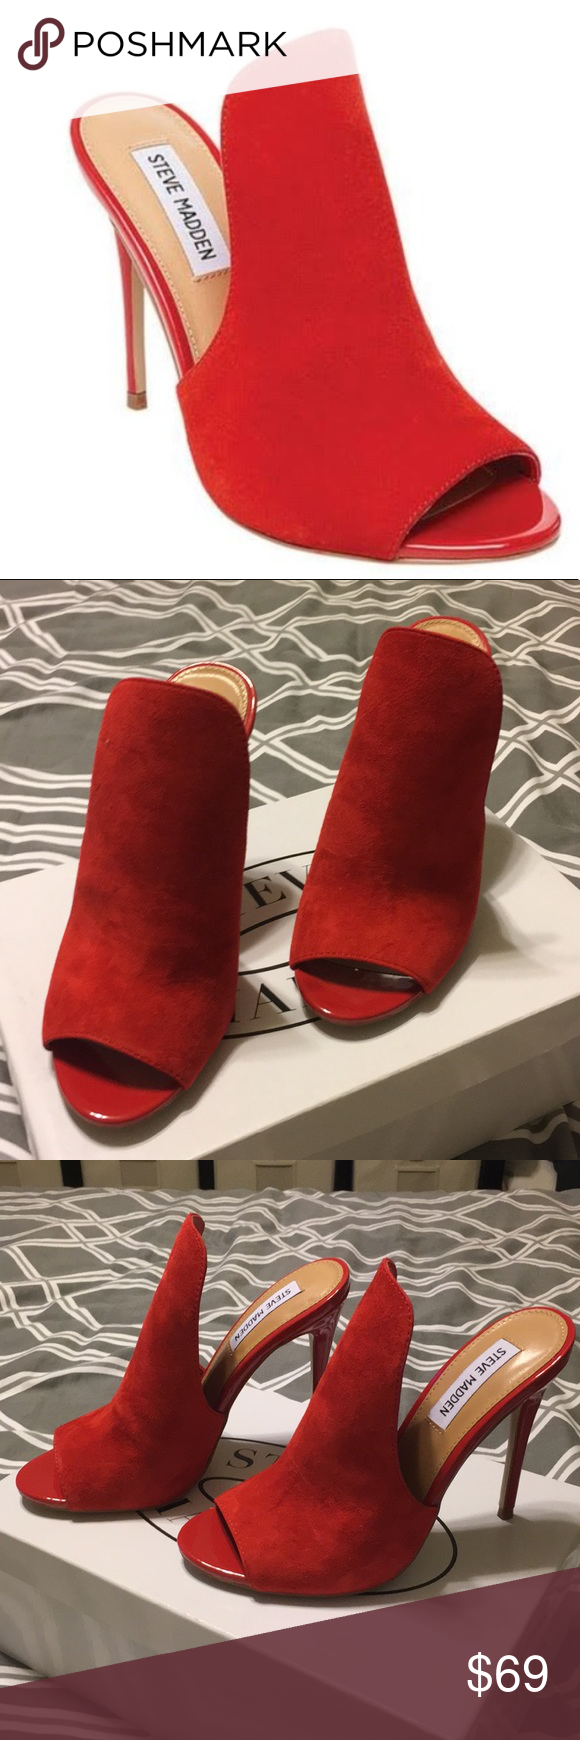 Steve Madden Sinful Red Suede Heel